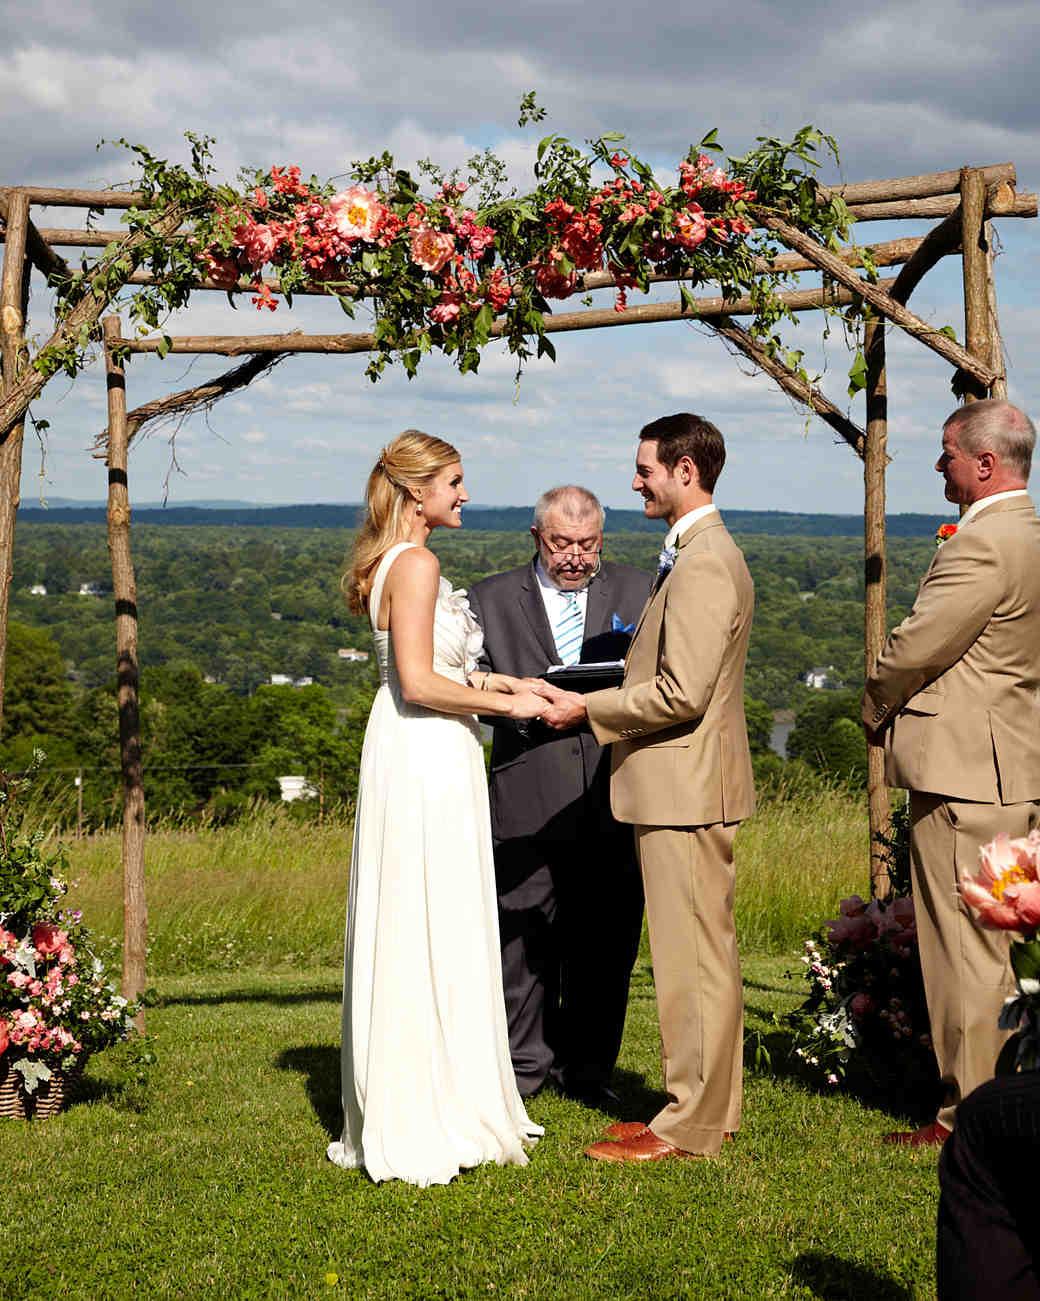 leanna-matt-wedding-1793-s111371-0615.jpg